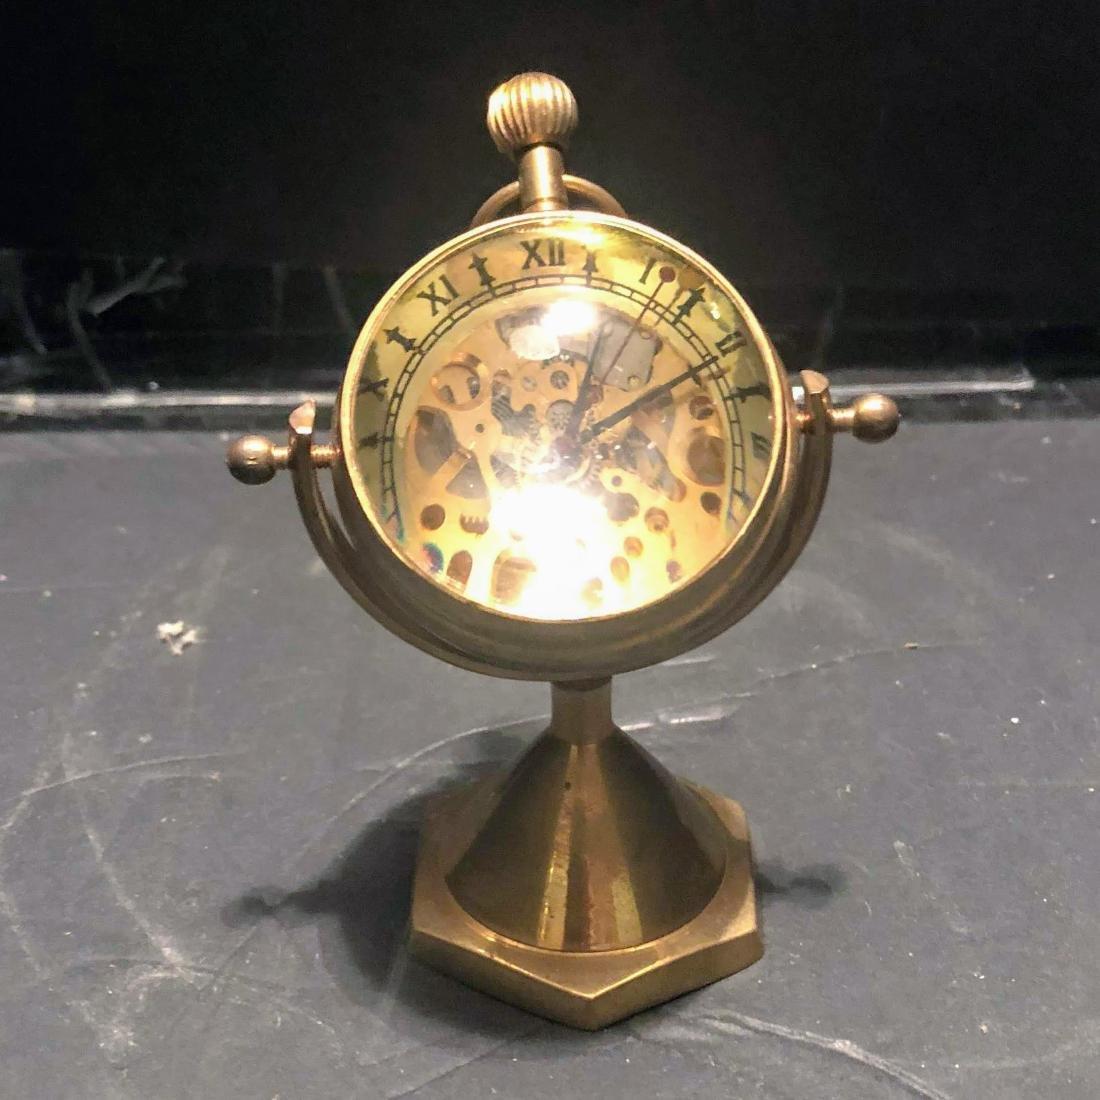 Antique Luxury Desk Table Clocks Big Ball Magnifying